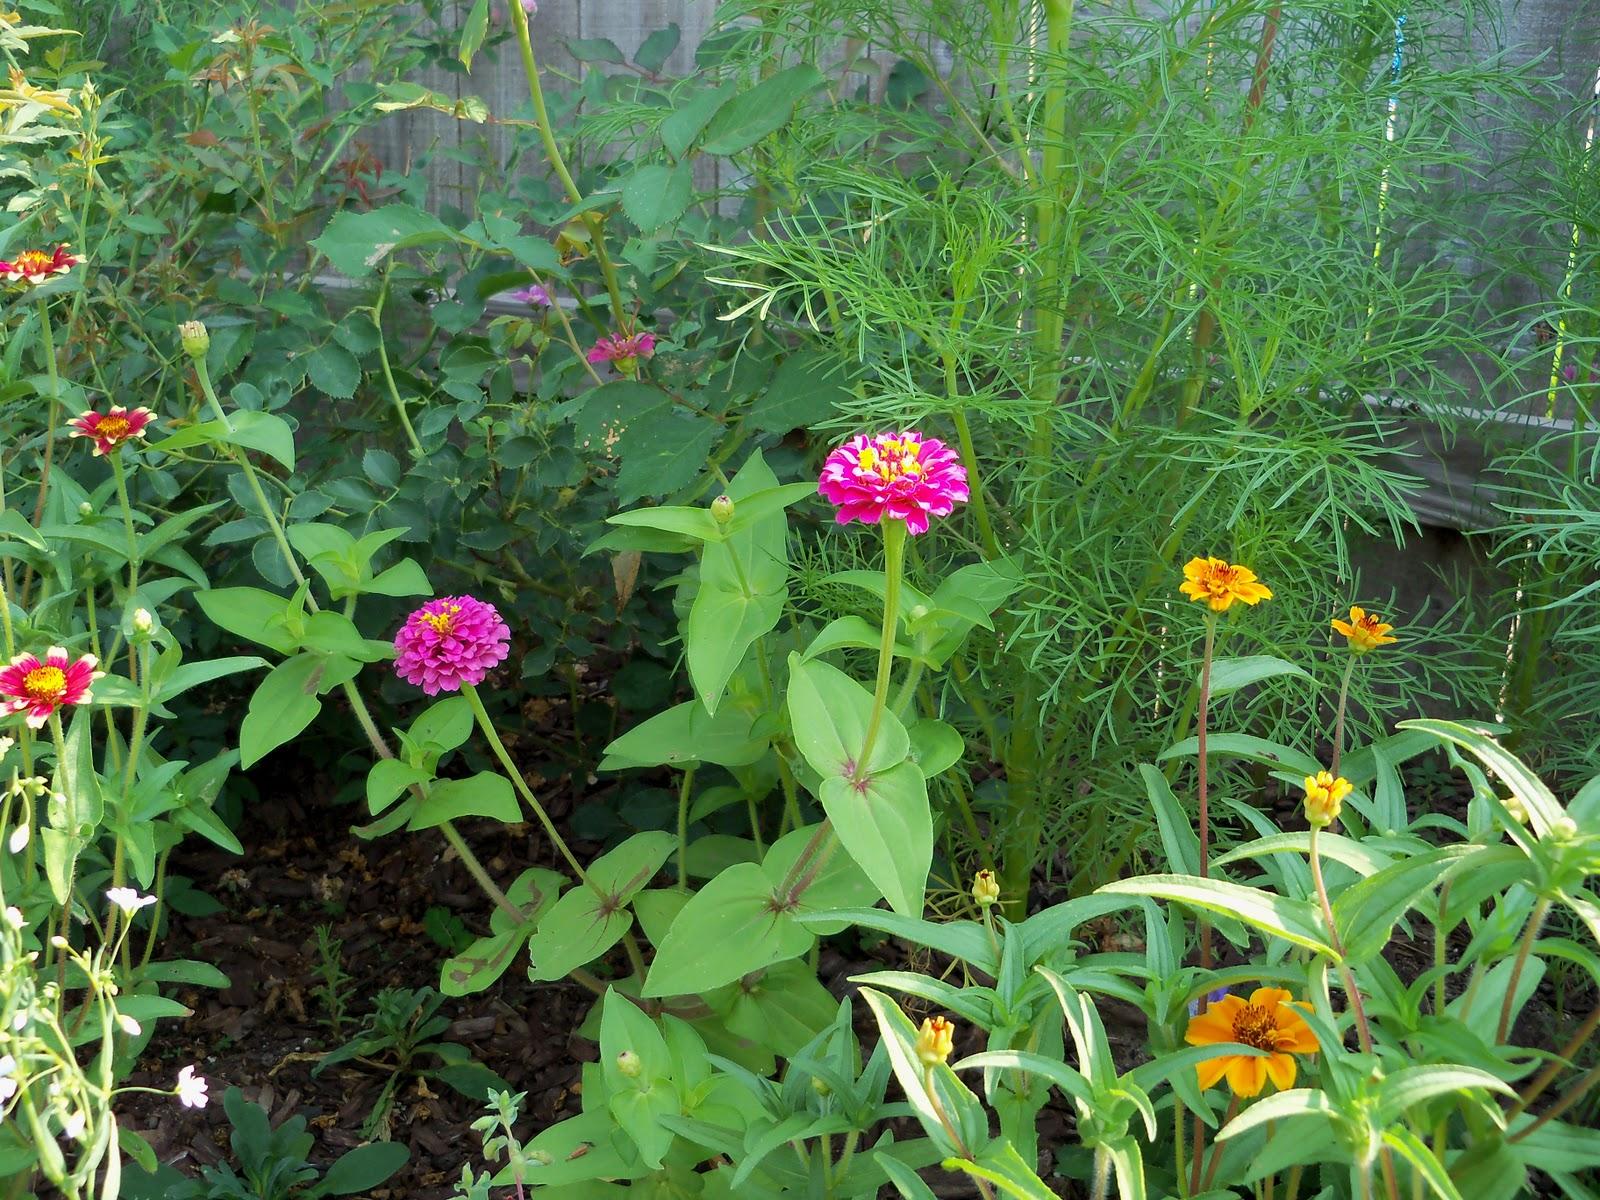 Gardening 2010, Part Two - 101_3028.JPG